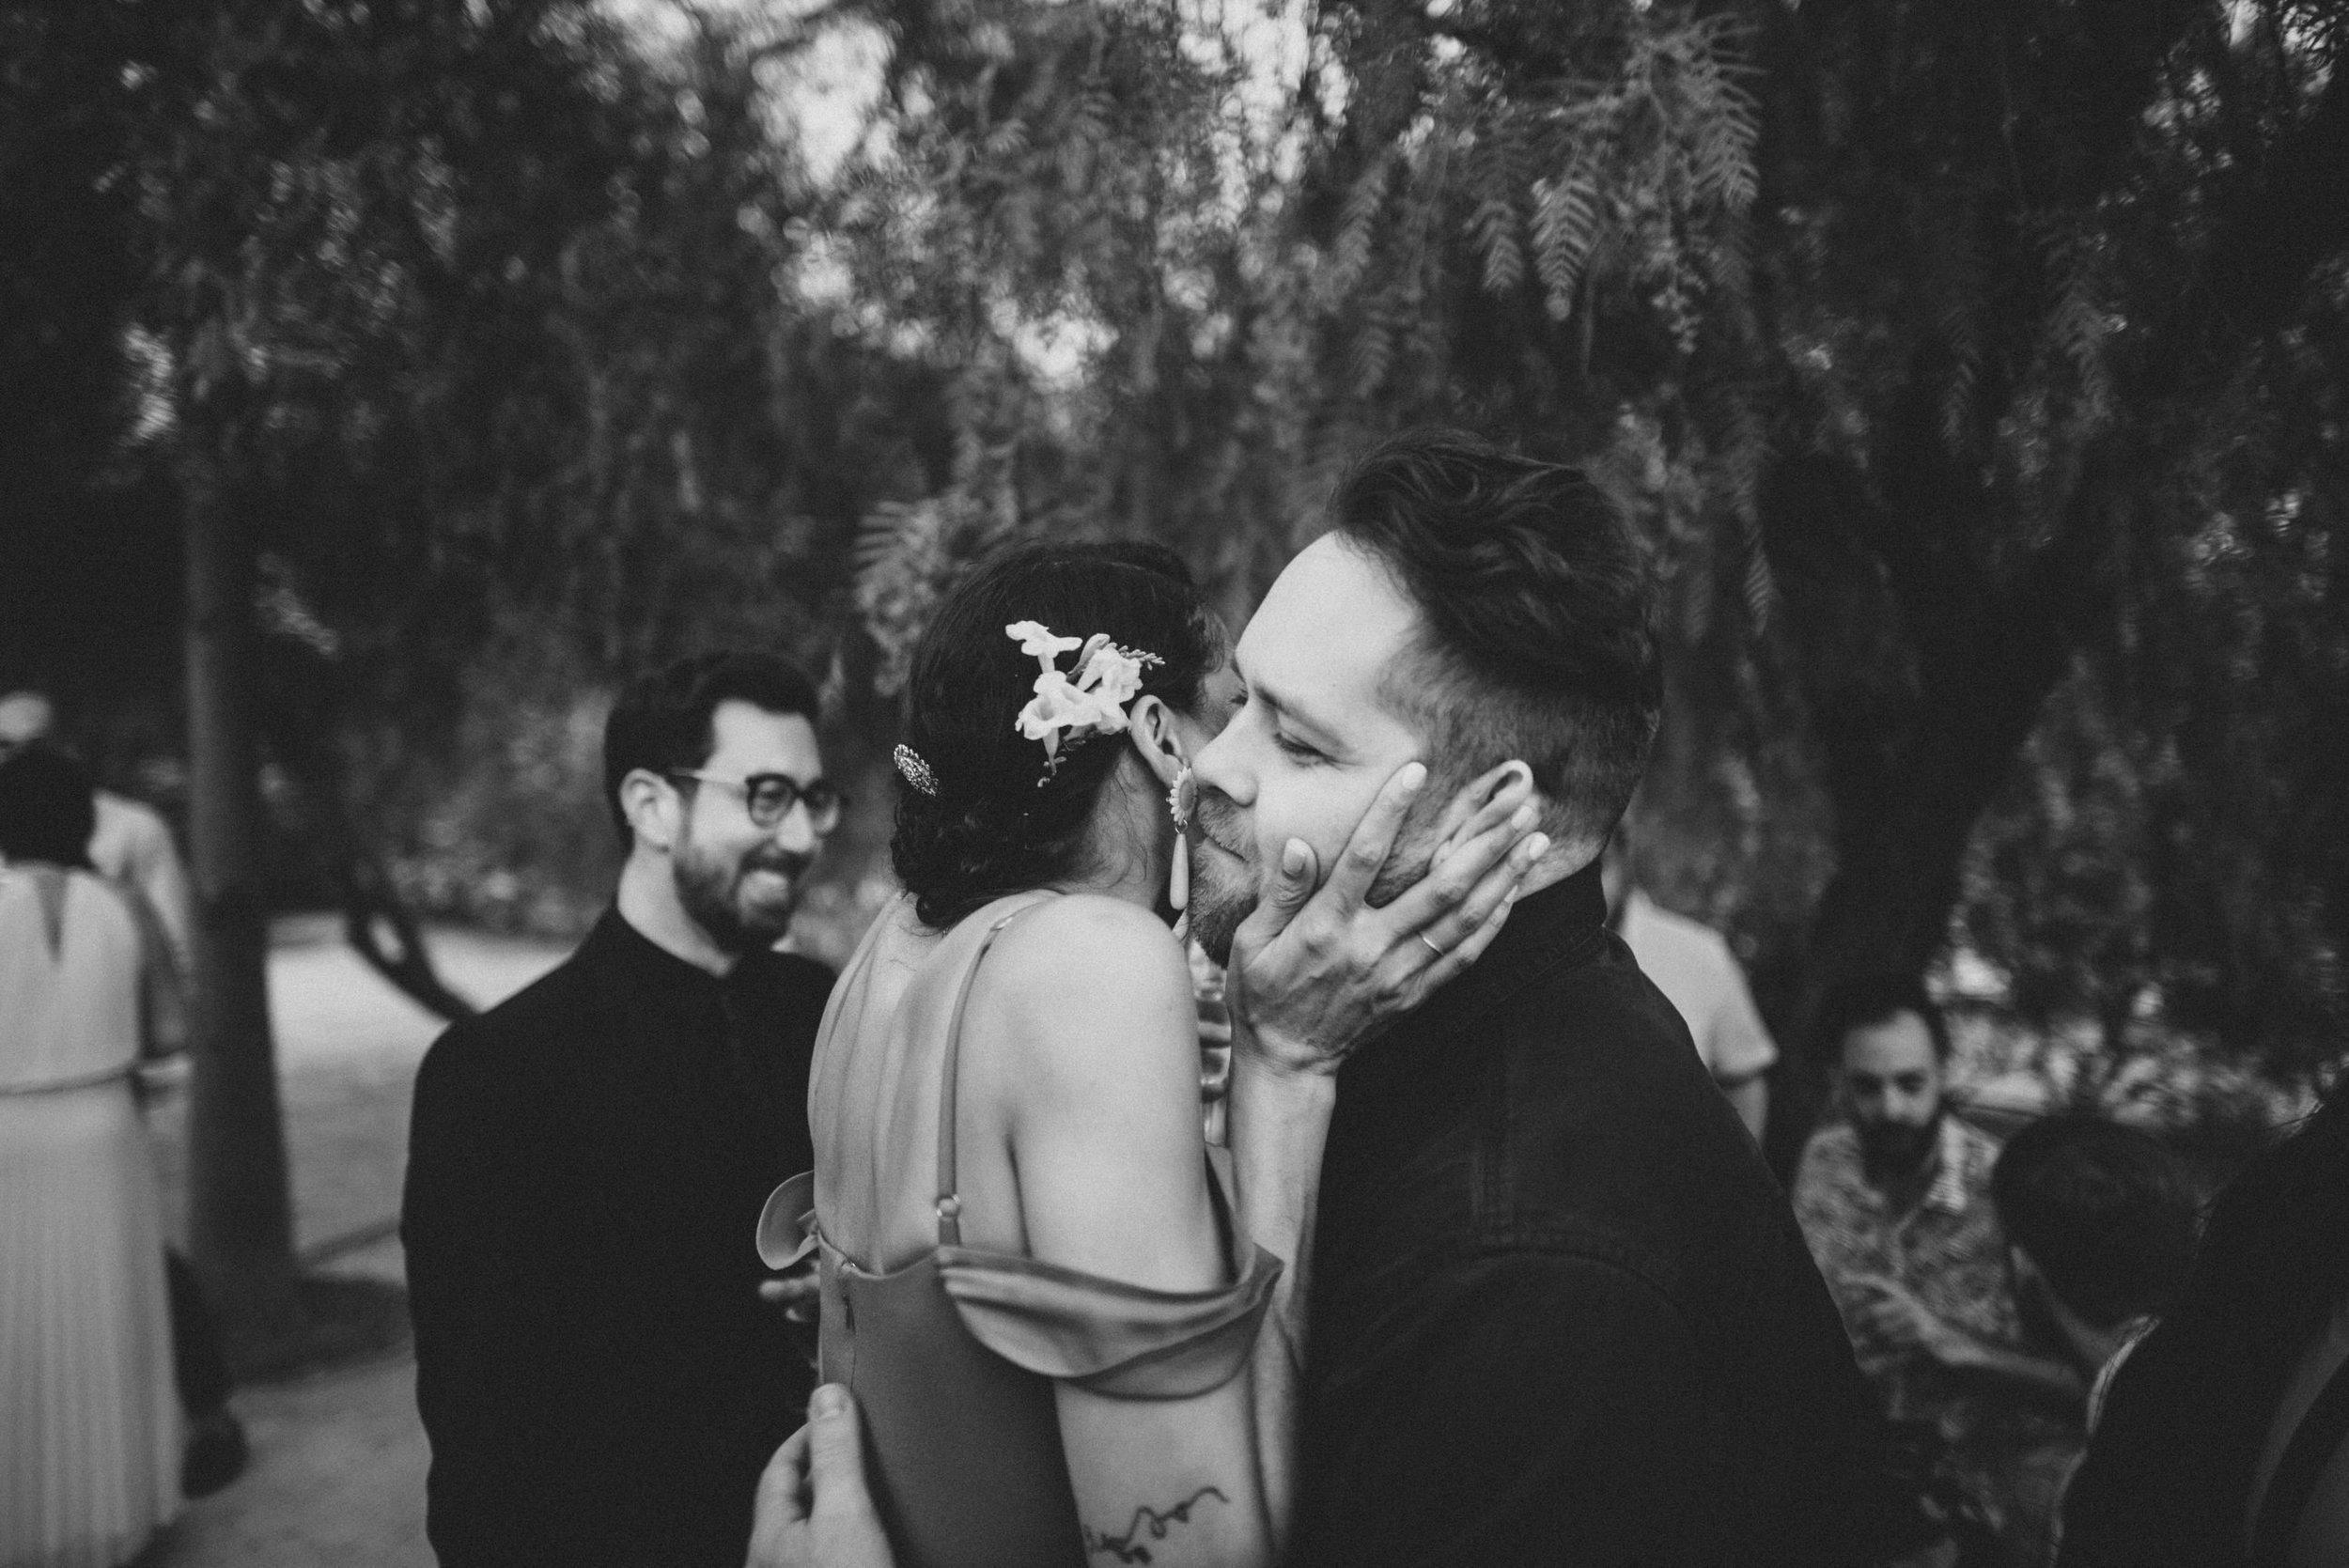 Andres+Amarillo+fotografo+boda+sevilla+natural+sin+poses+hacienda+san+rafael (12).JPG